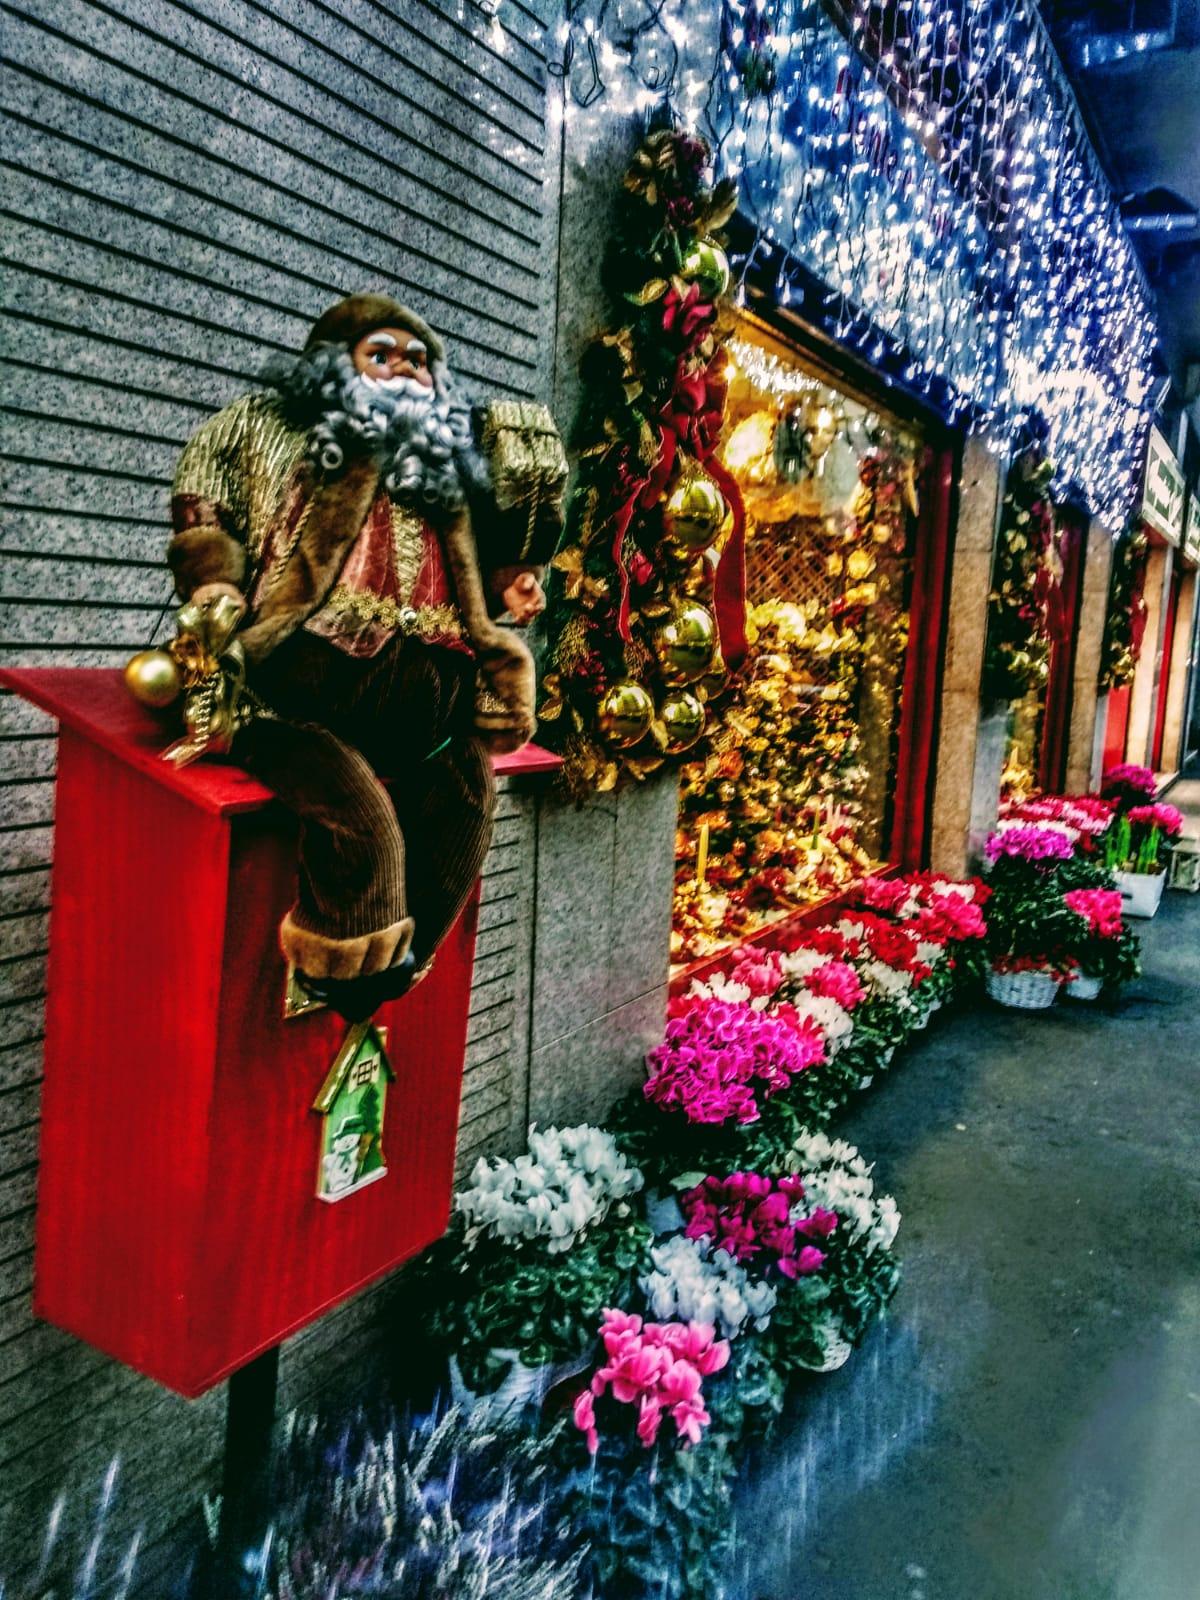 milan-festive-spirit.JPG